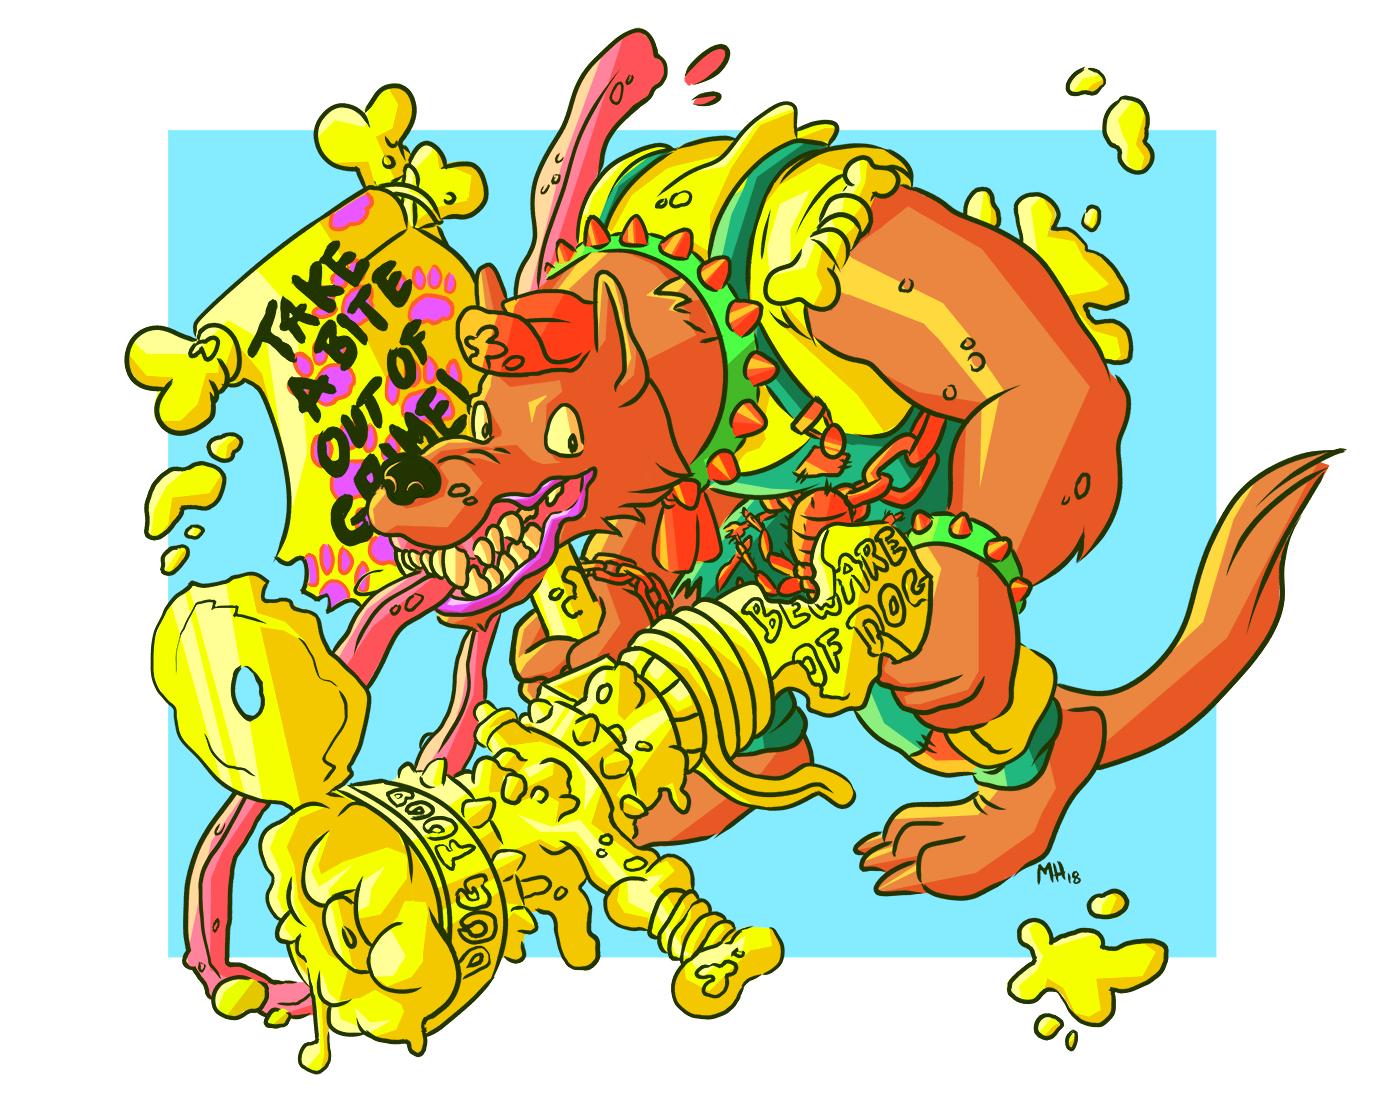 Junkyard (Toxic Crusaders)